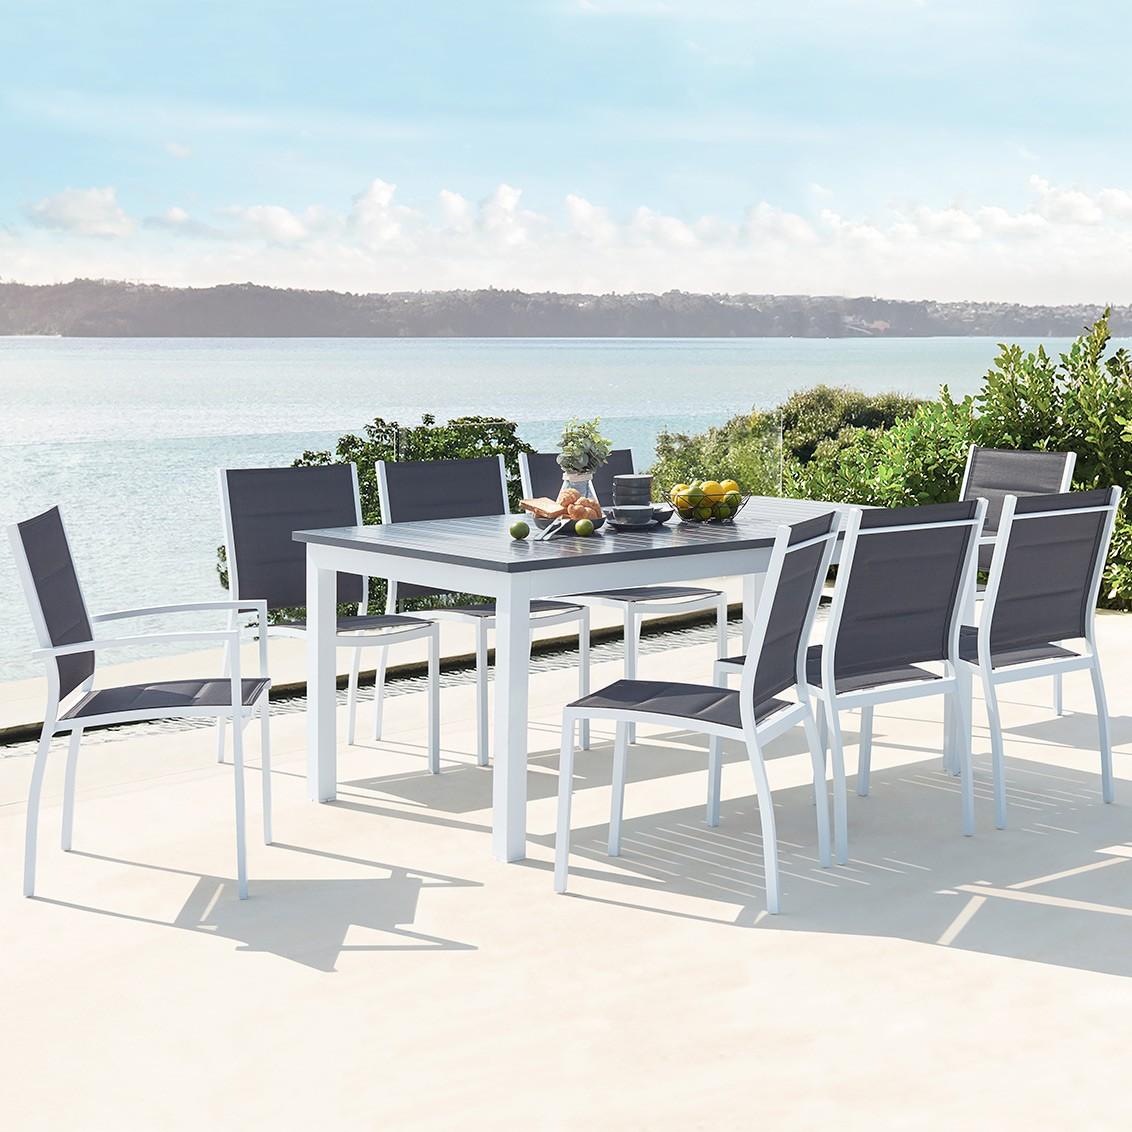 Mazzara 8 blanc : salon de jardin extensible en aluminium + 8 assises en  textilène